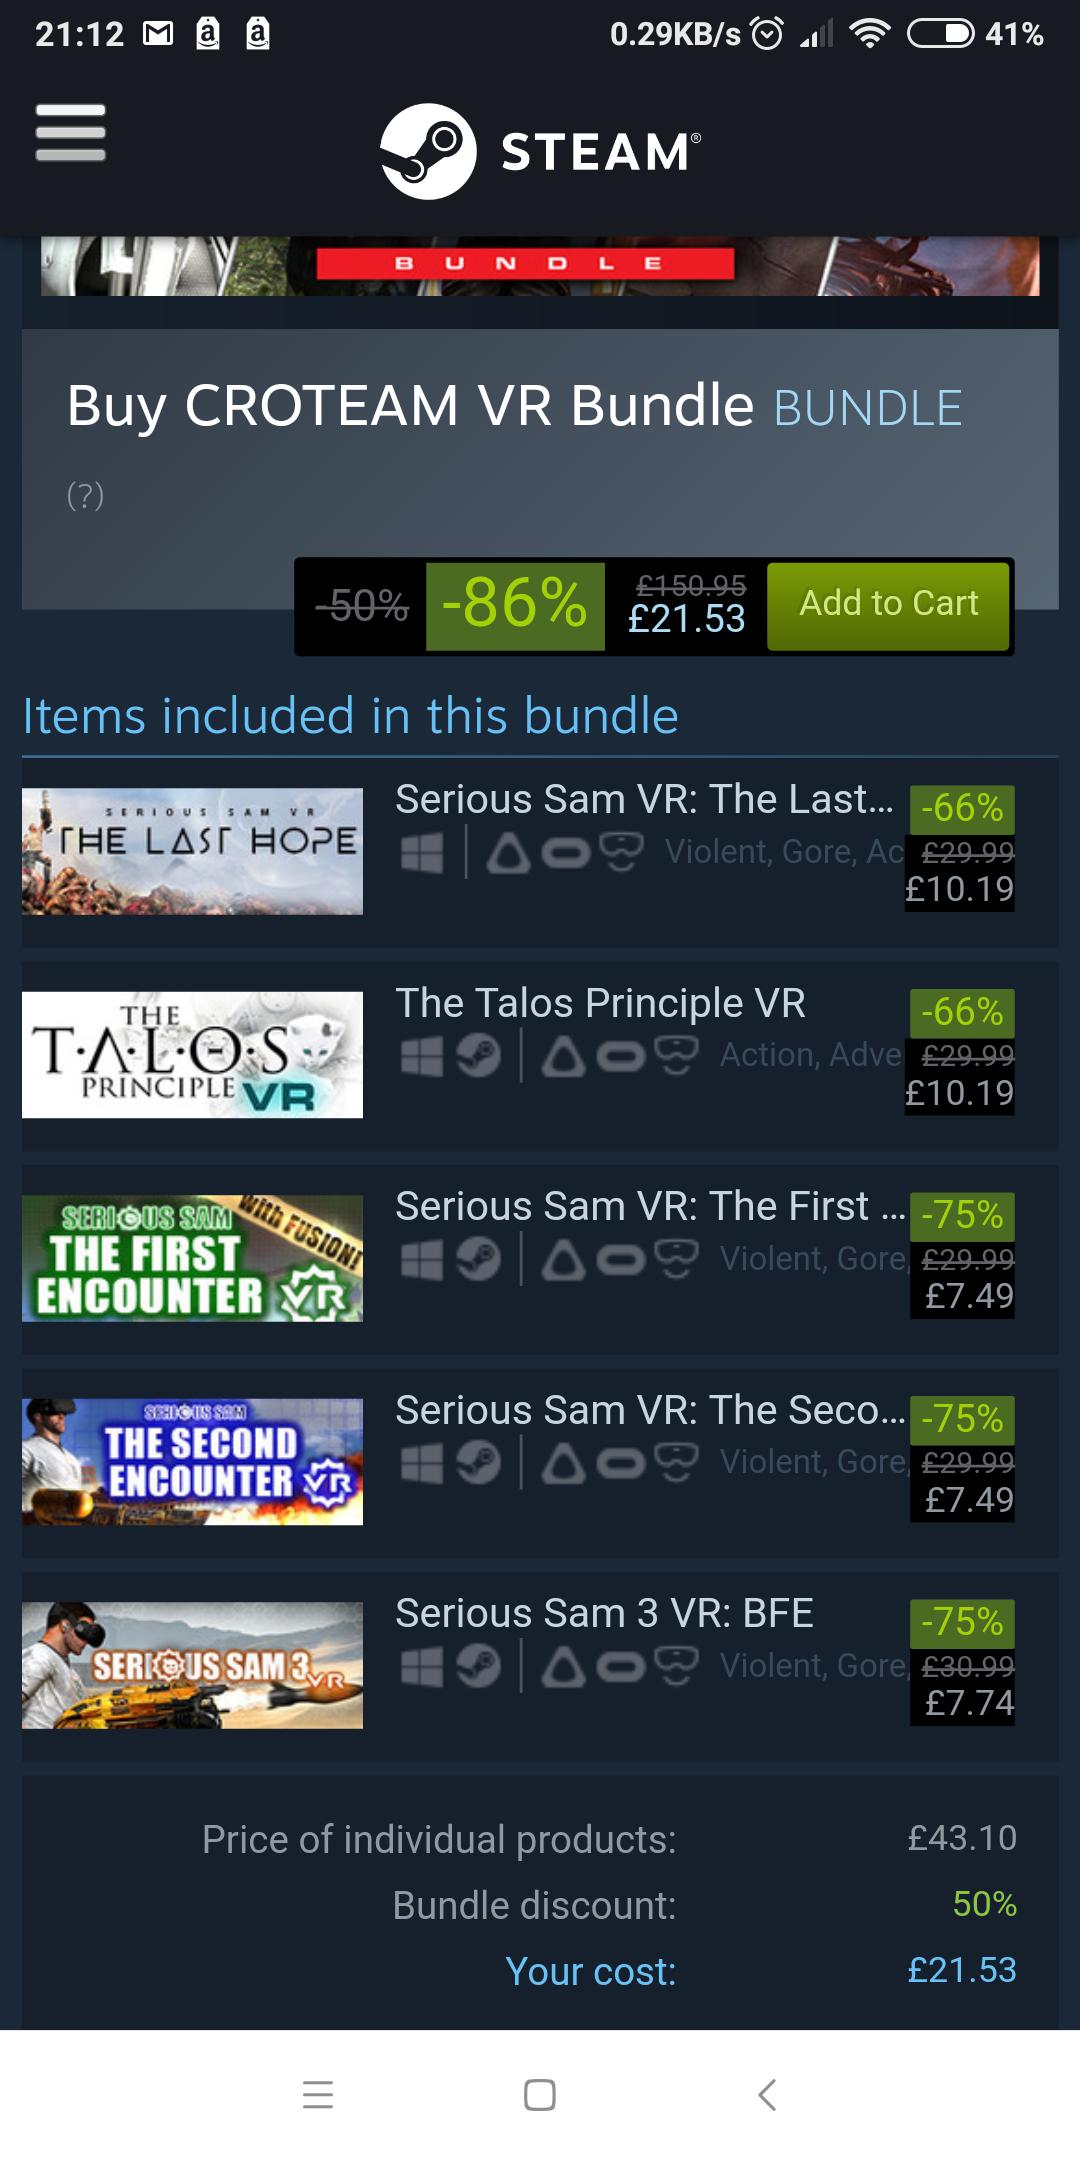 Croteam VR bundle  @ Steam just £21.53